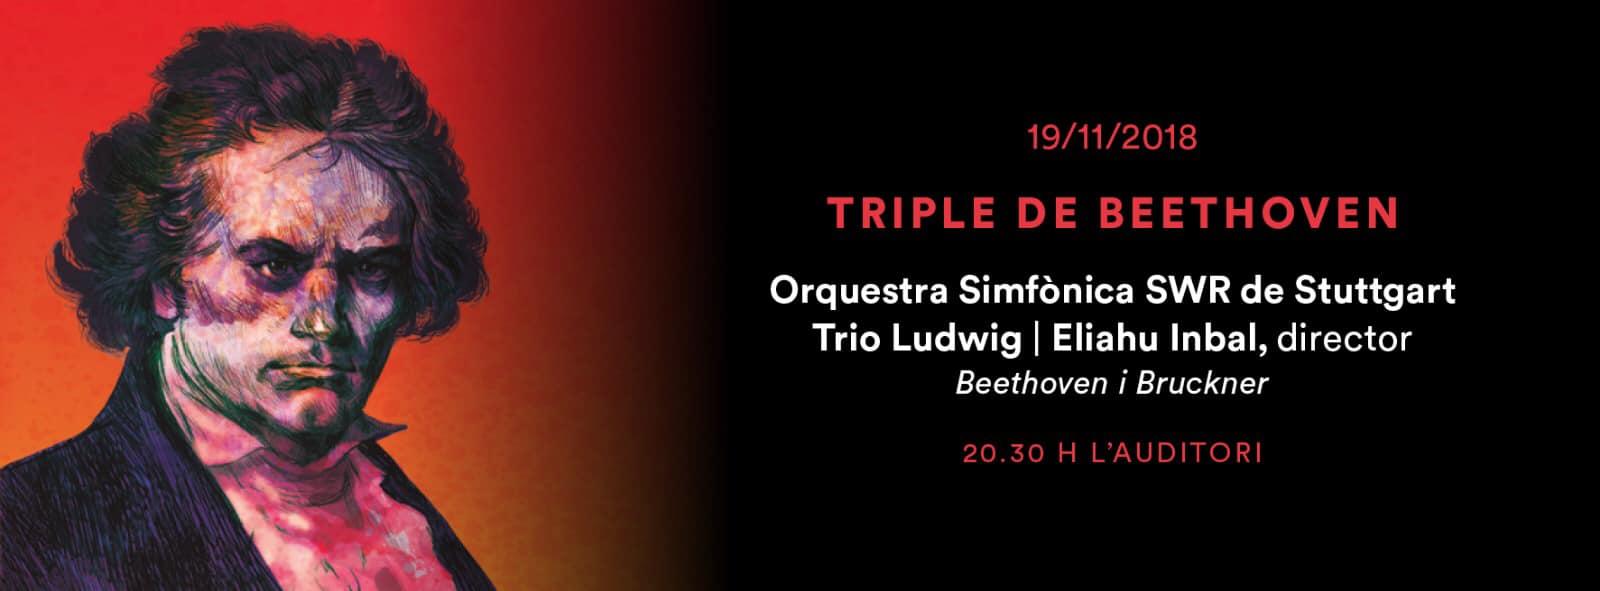 Sinfonía Romántica Barcelona.